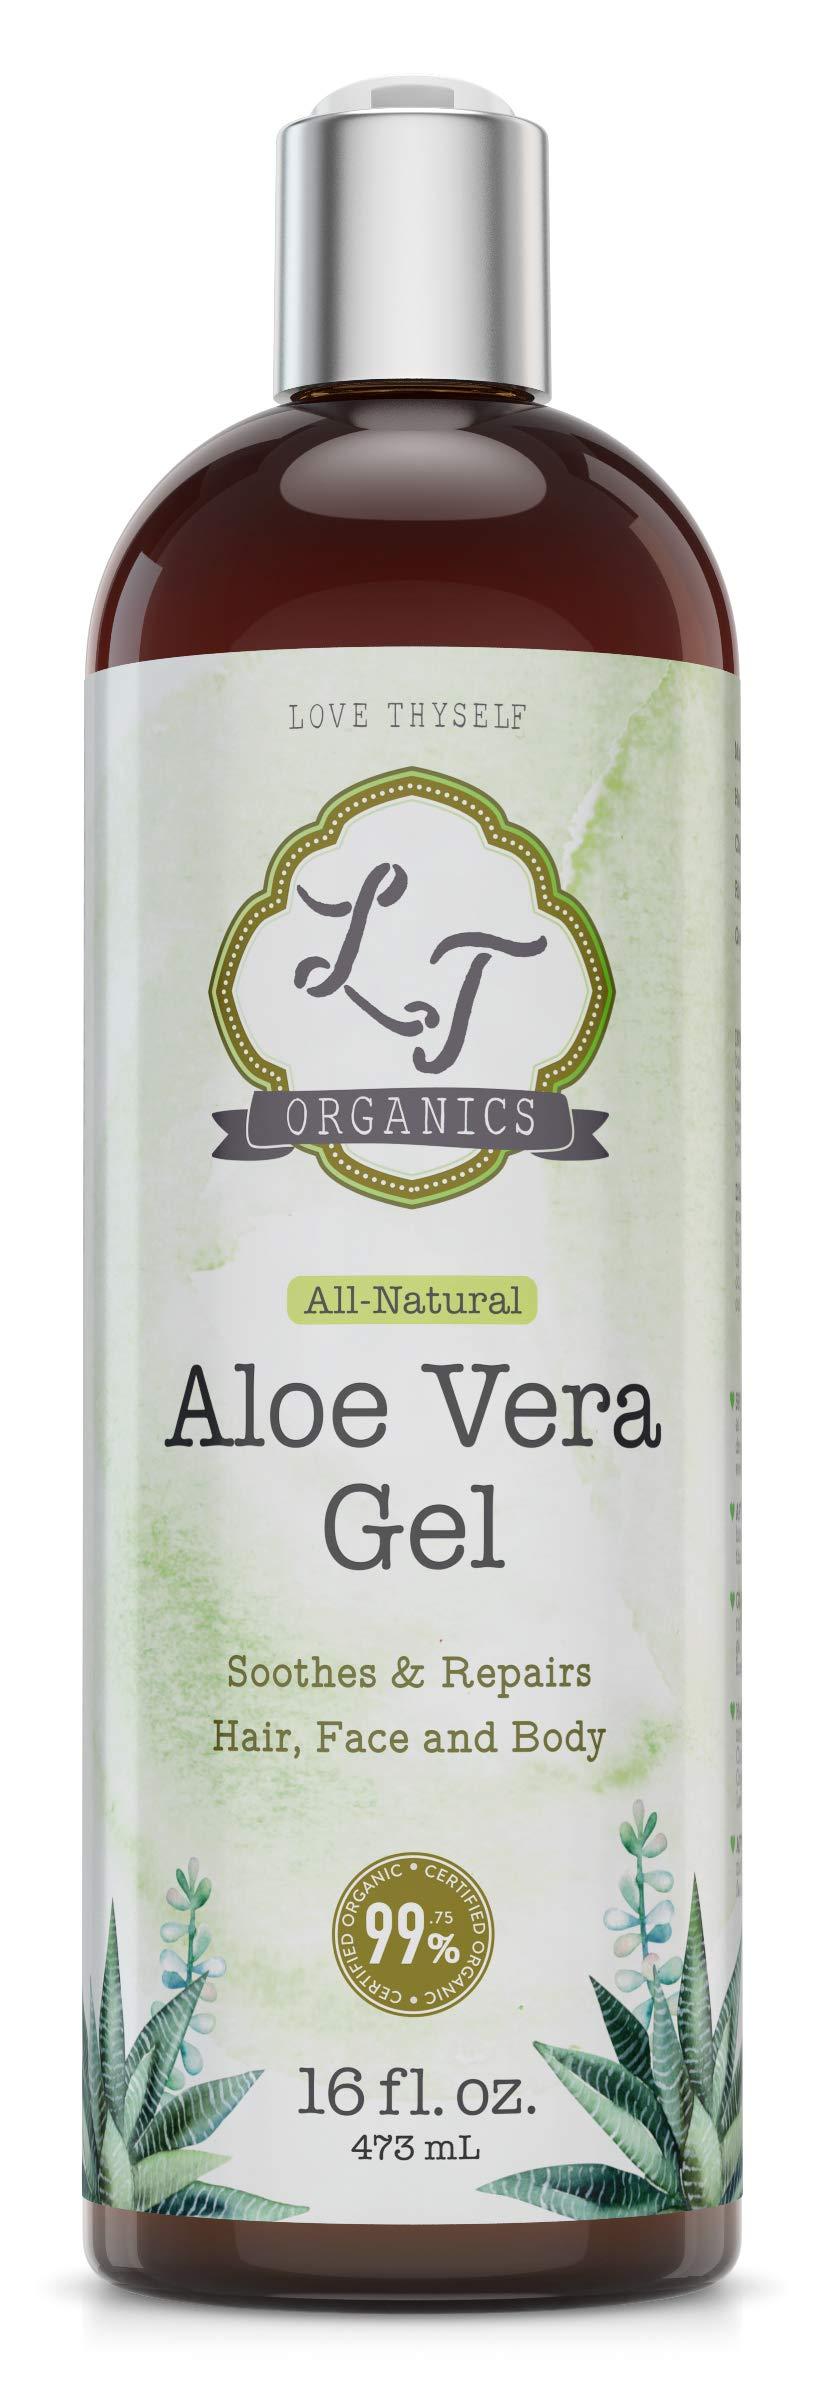 99% Organic Aloe Vera Gel 16oz  For Face, Hair, Skin Care & Acne, Sunburn, Bug Bite, Rashes, Eczema Relief   100 Percent Pure & Natural Cold Pressed Aloe Vera   Chemical & Preservative Free